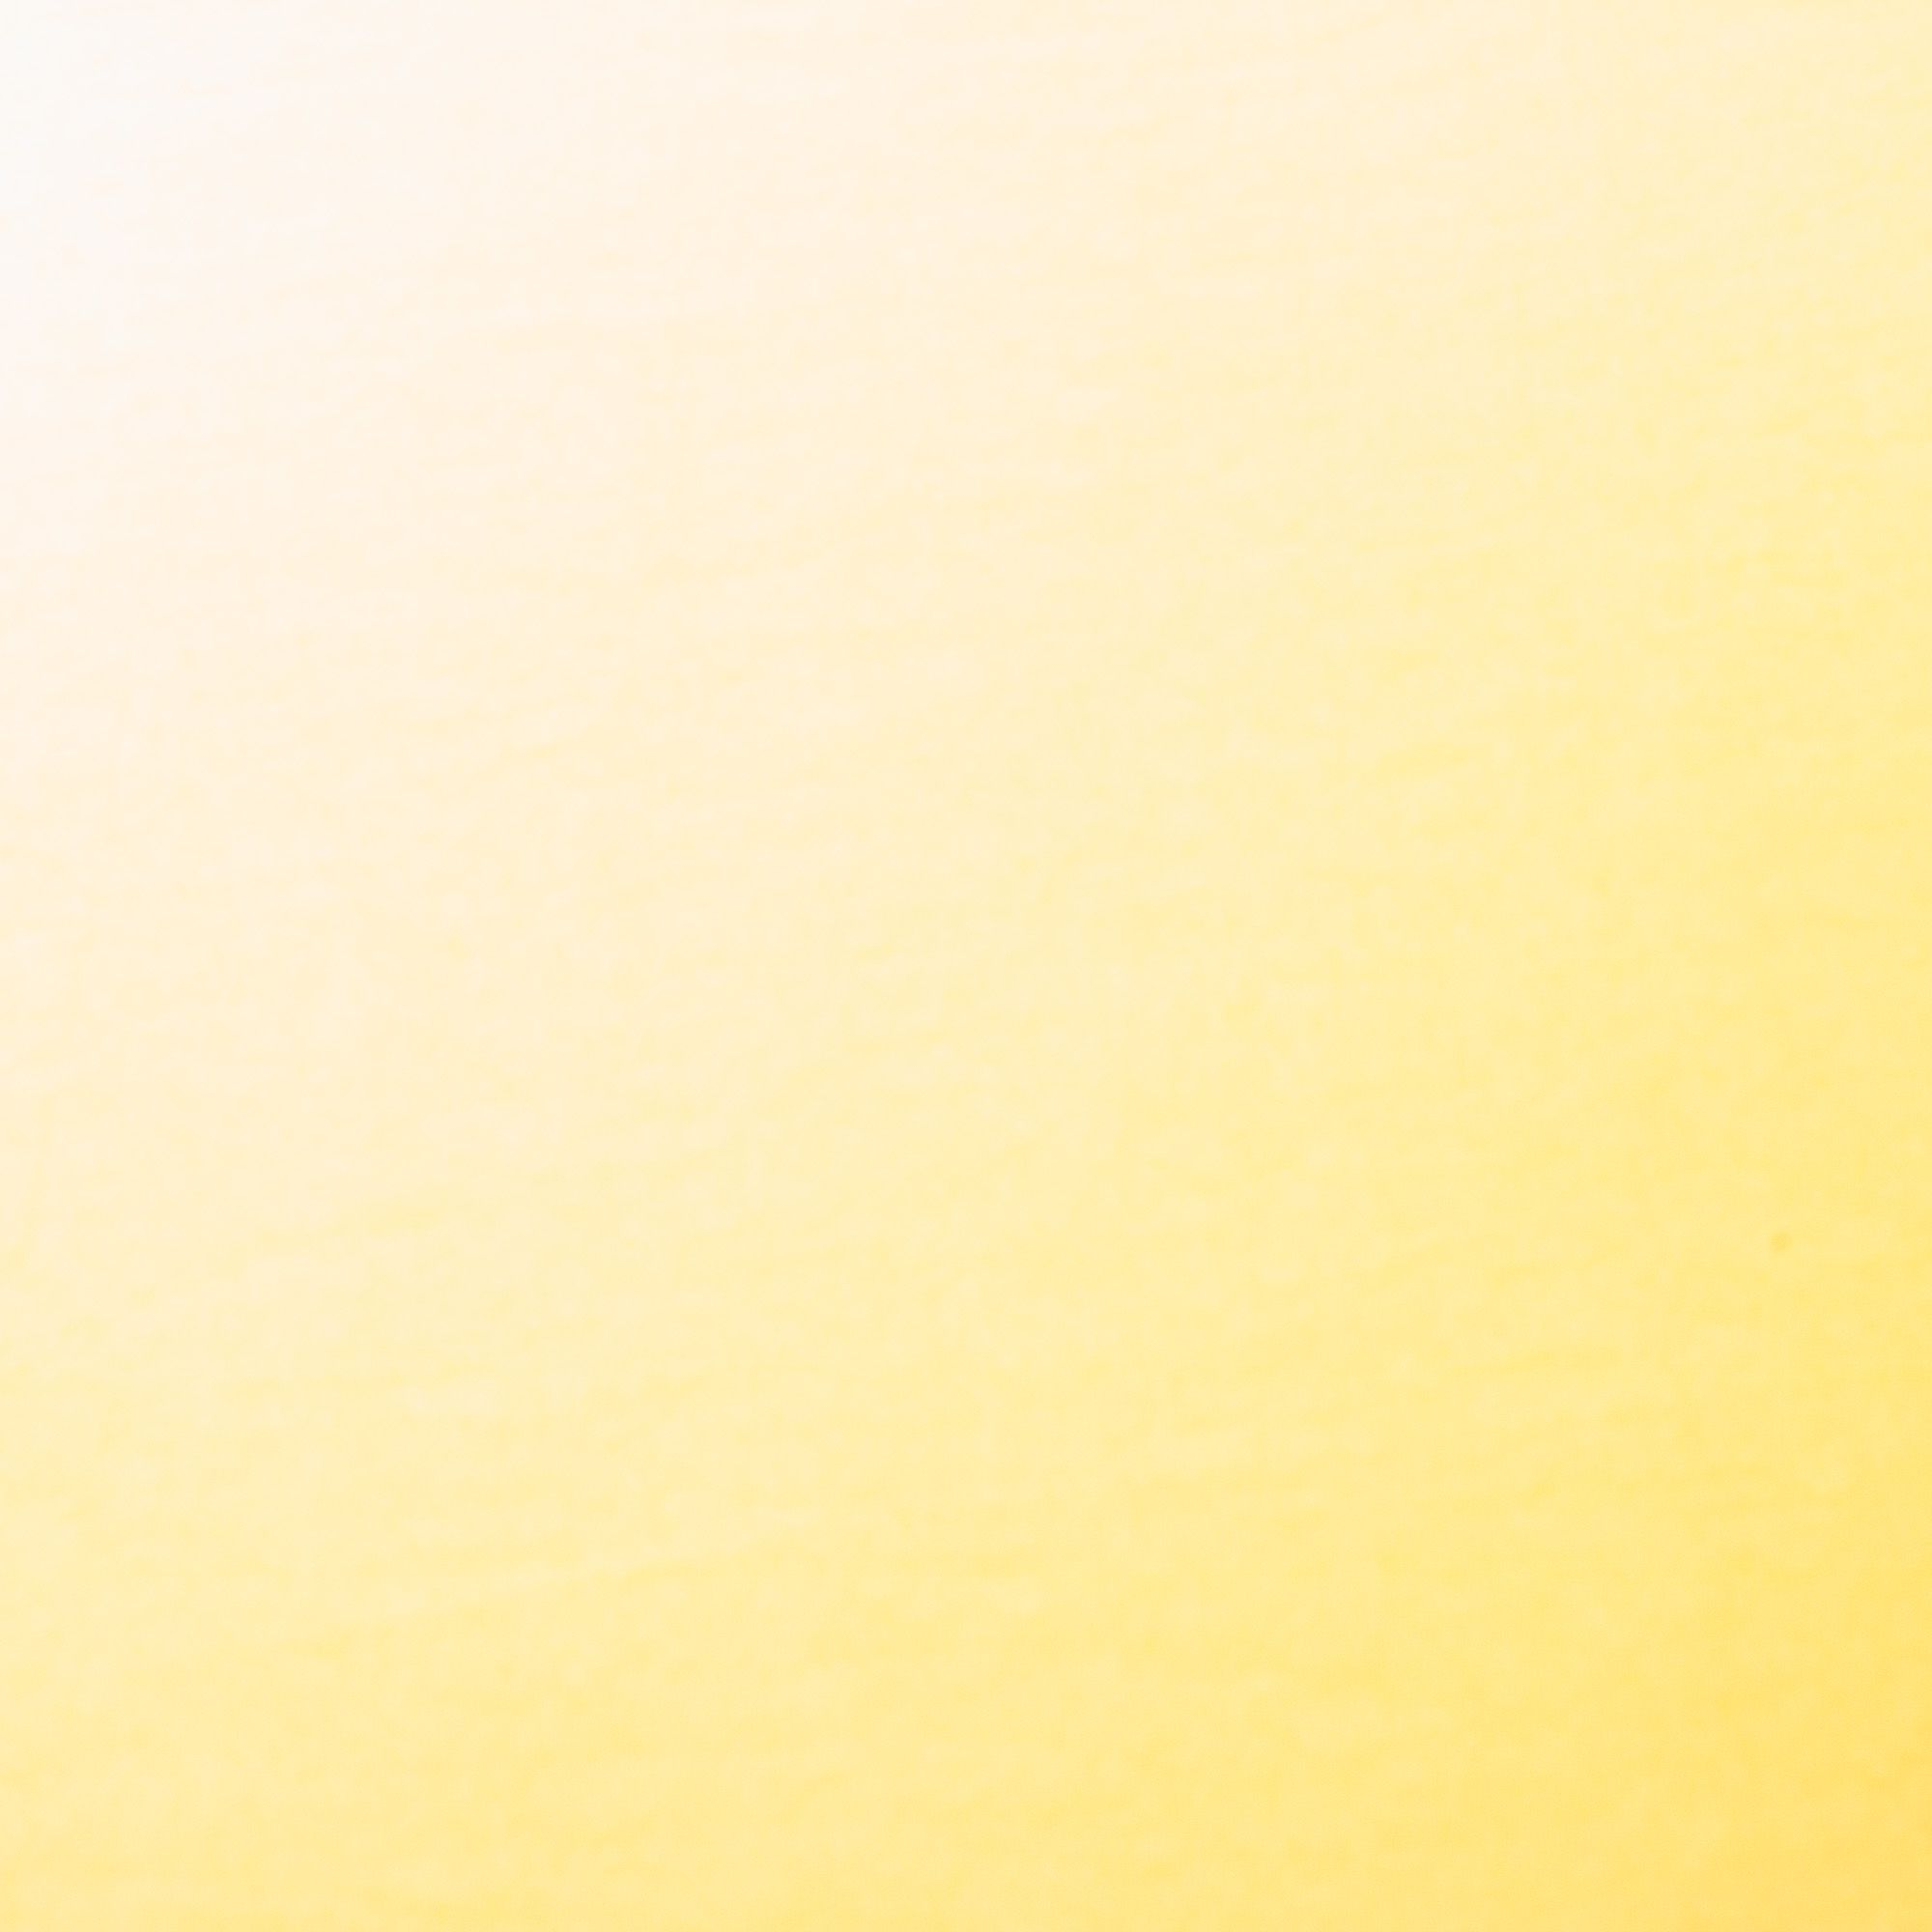 Tecido Malha Helanca Light Creme 100% Poliester 1,80 mt Largura